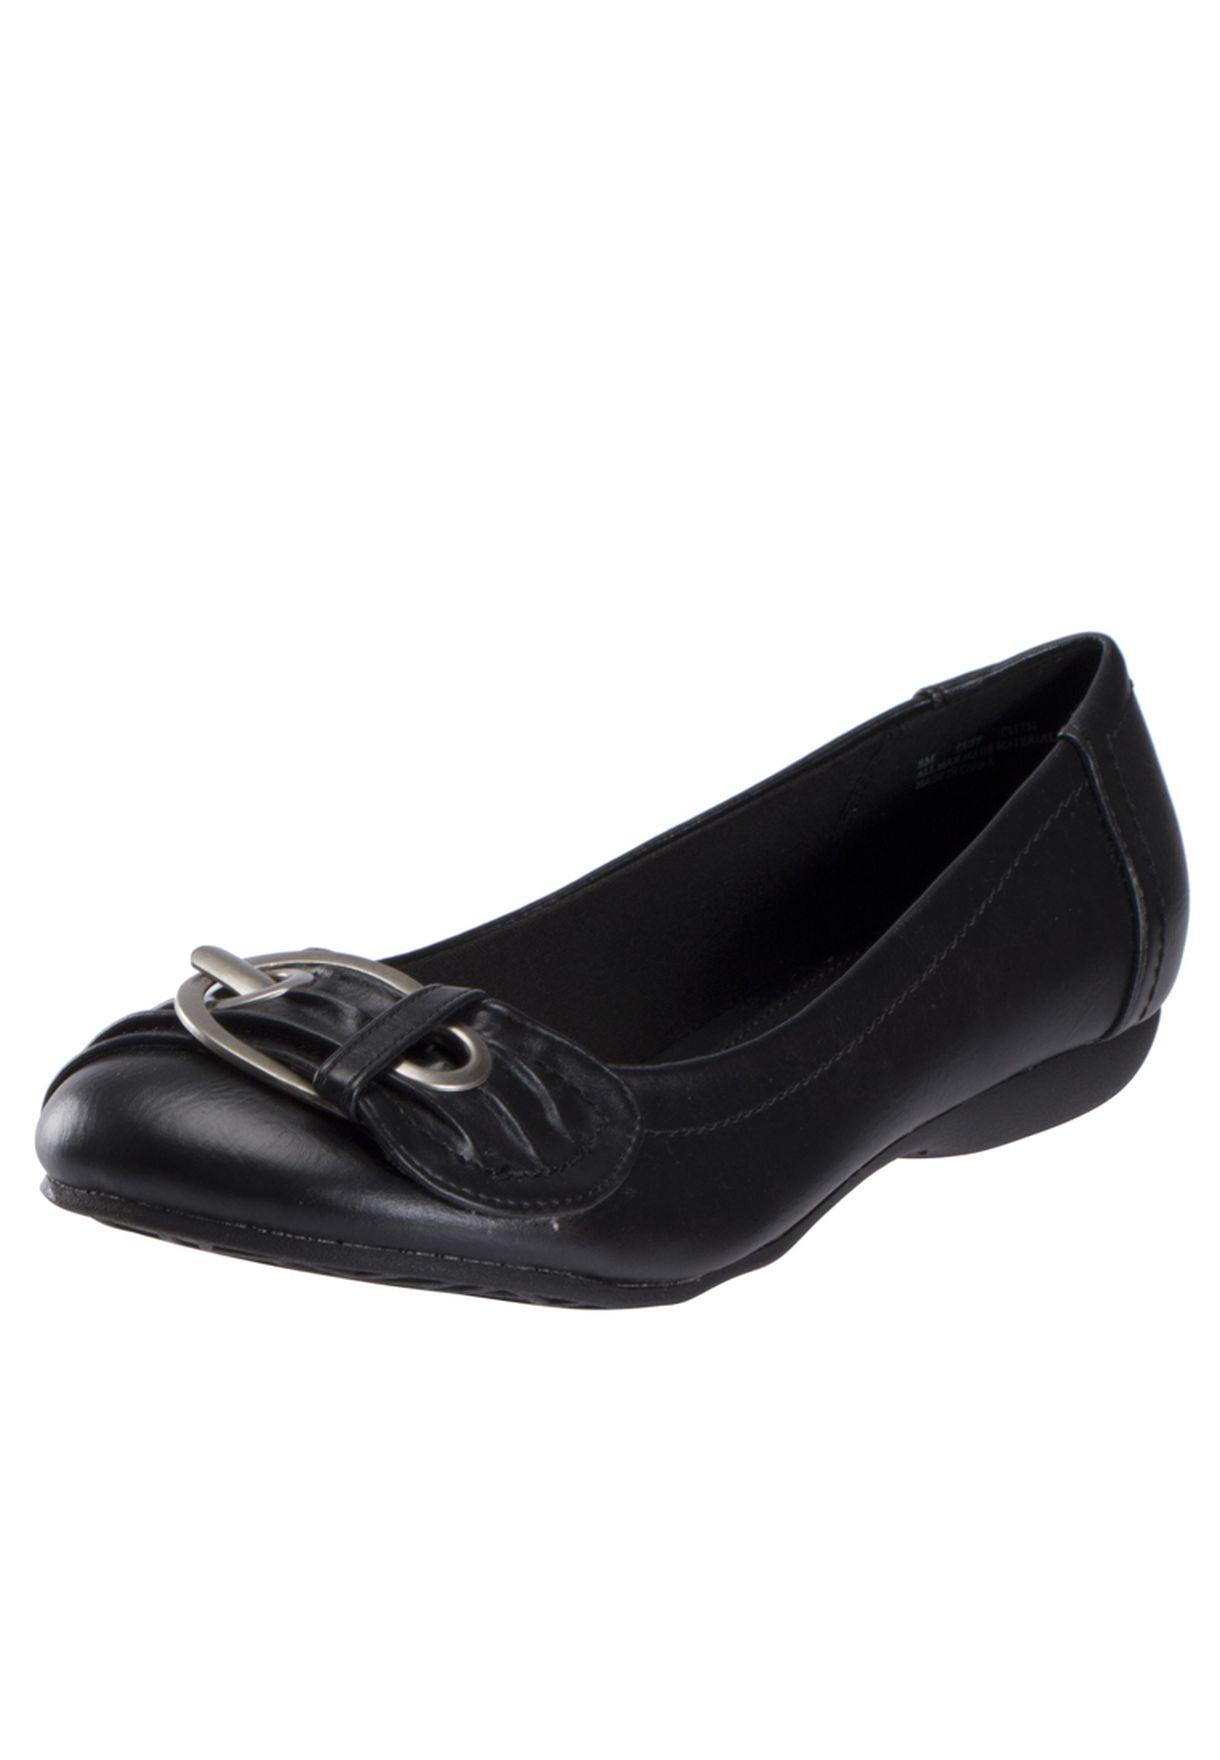 26e37d9ac تسوق Casual Ballerina Shoes ماركة ميا لون أسود في الكويت - MI852SH14CNT